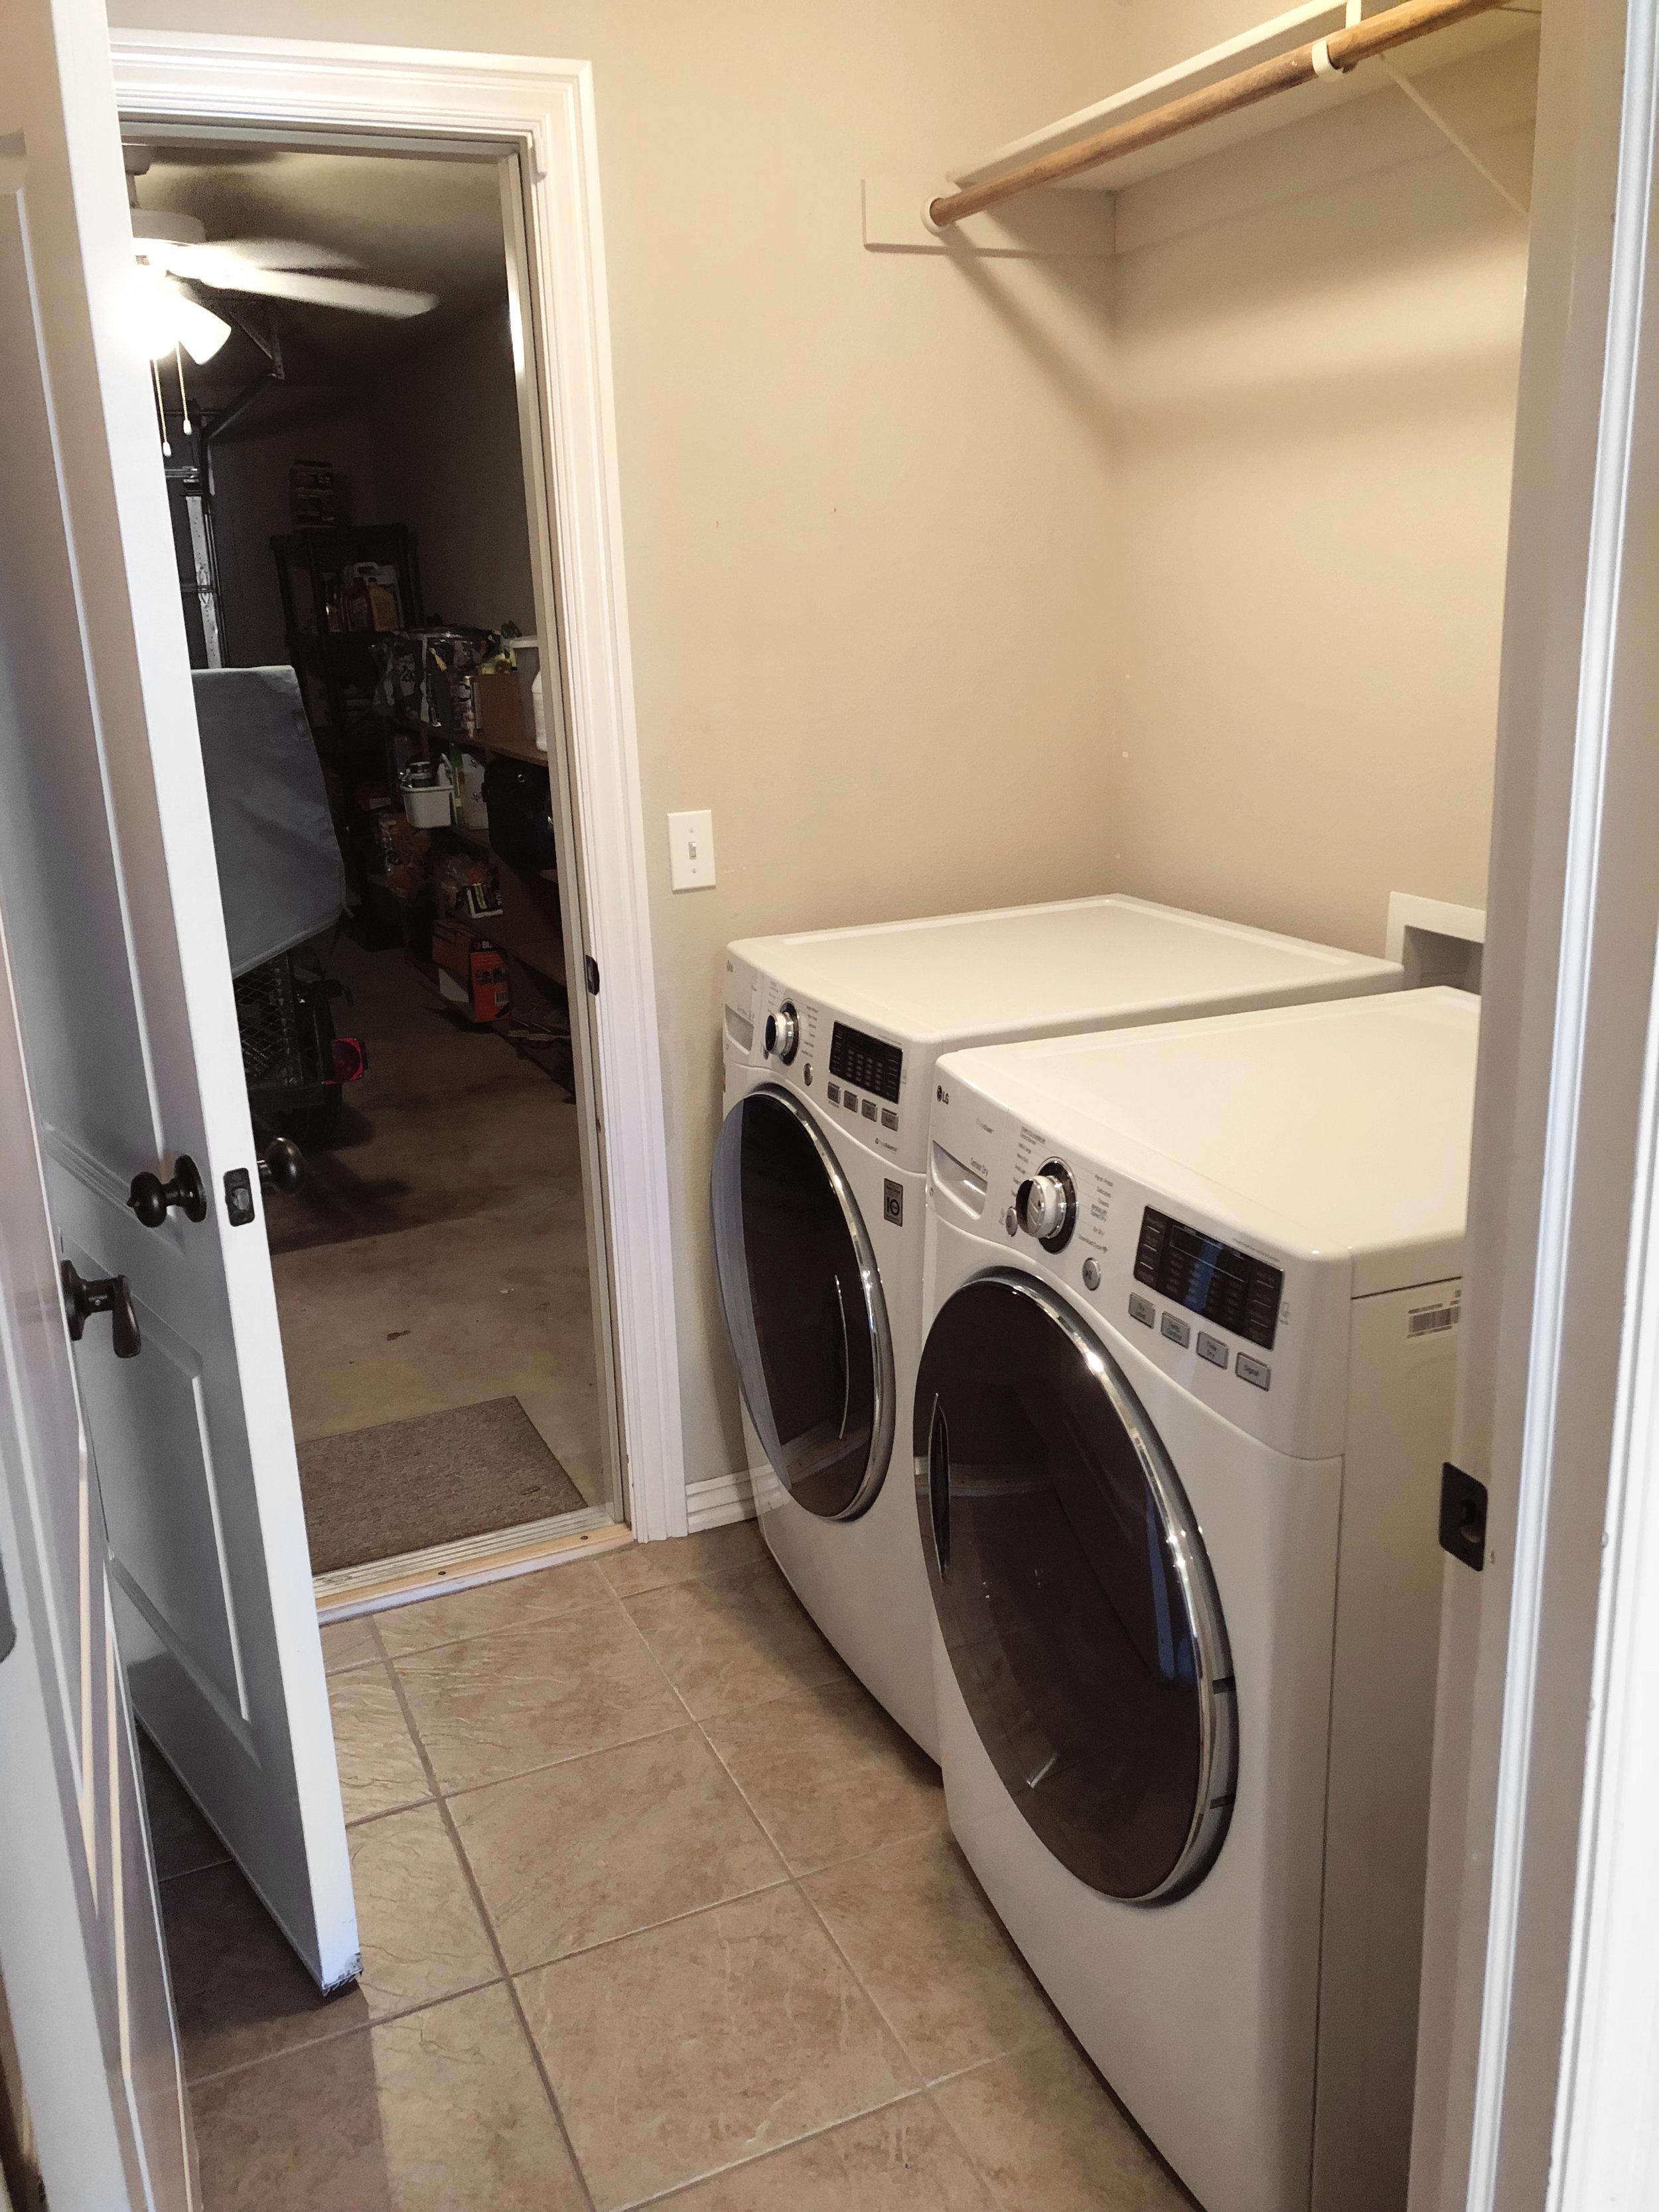 CornwallAve_Laundry.jpg